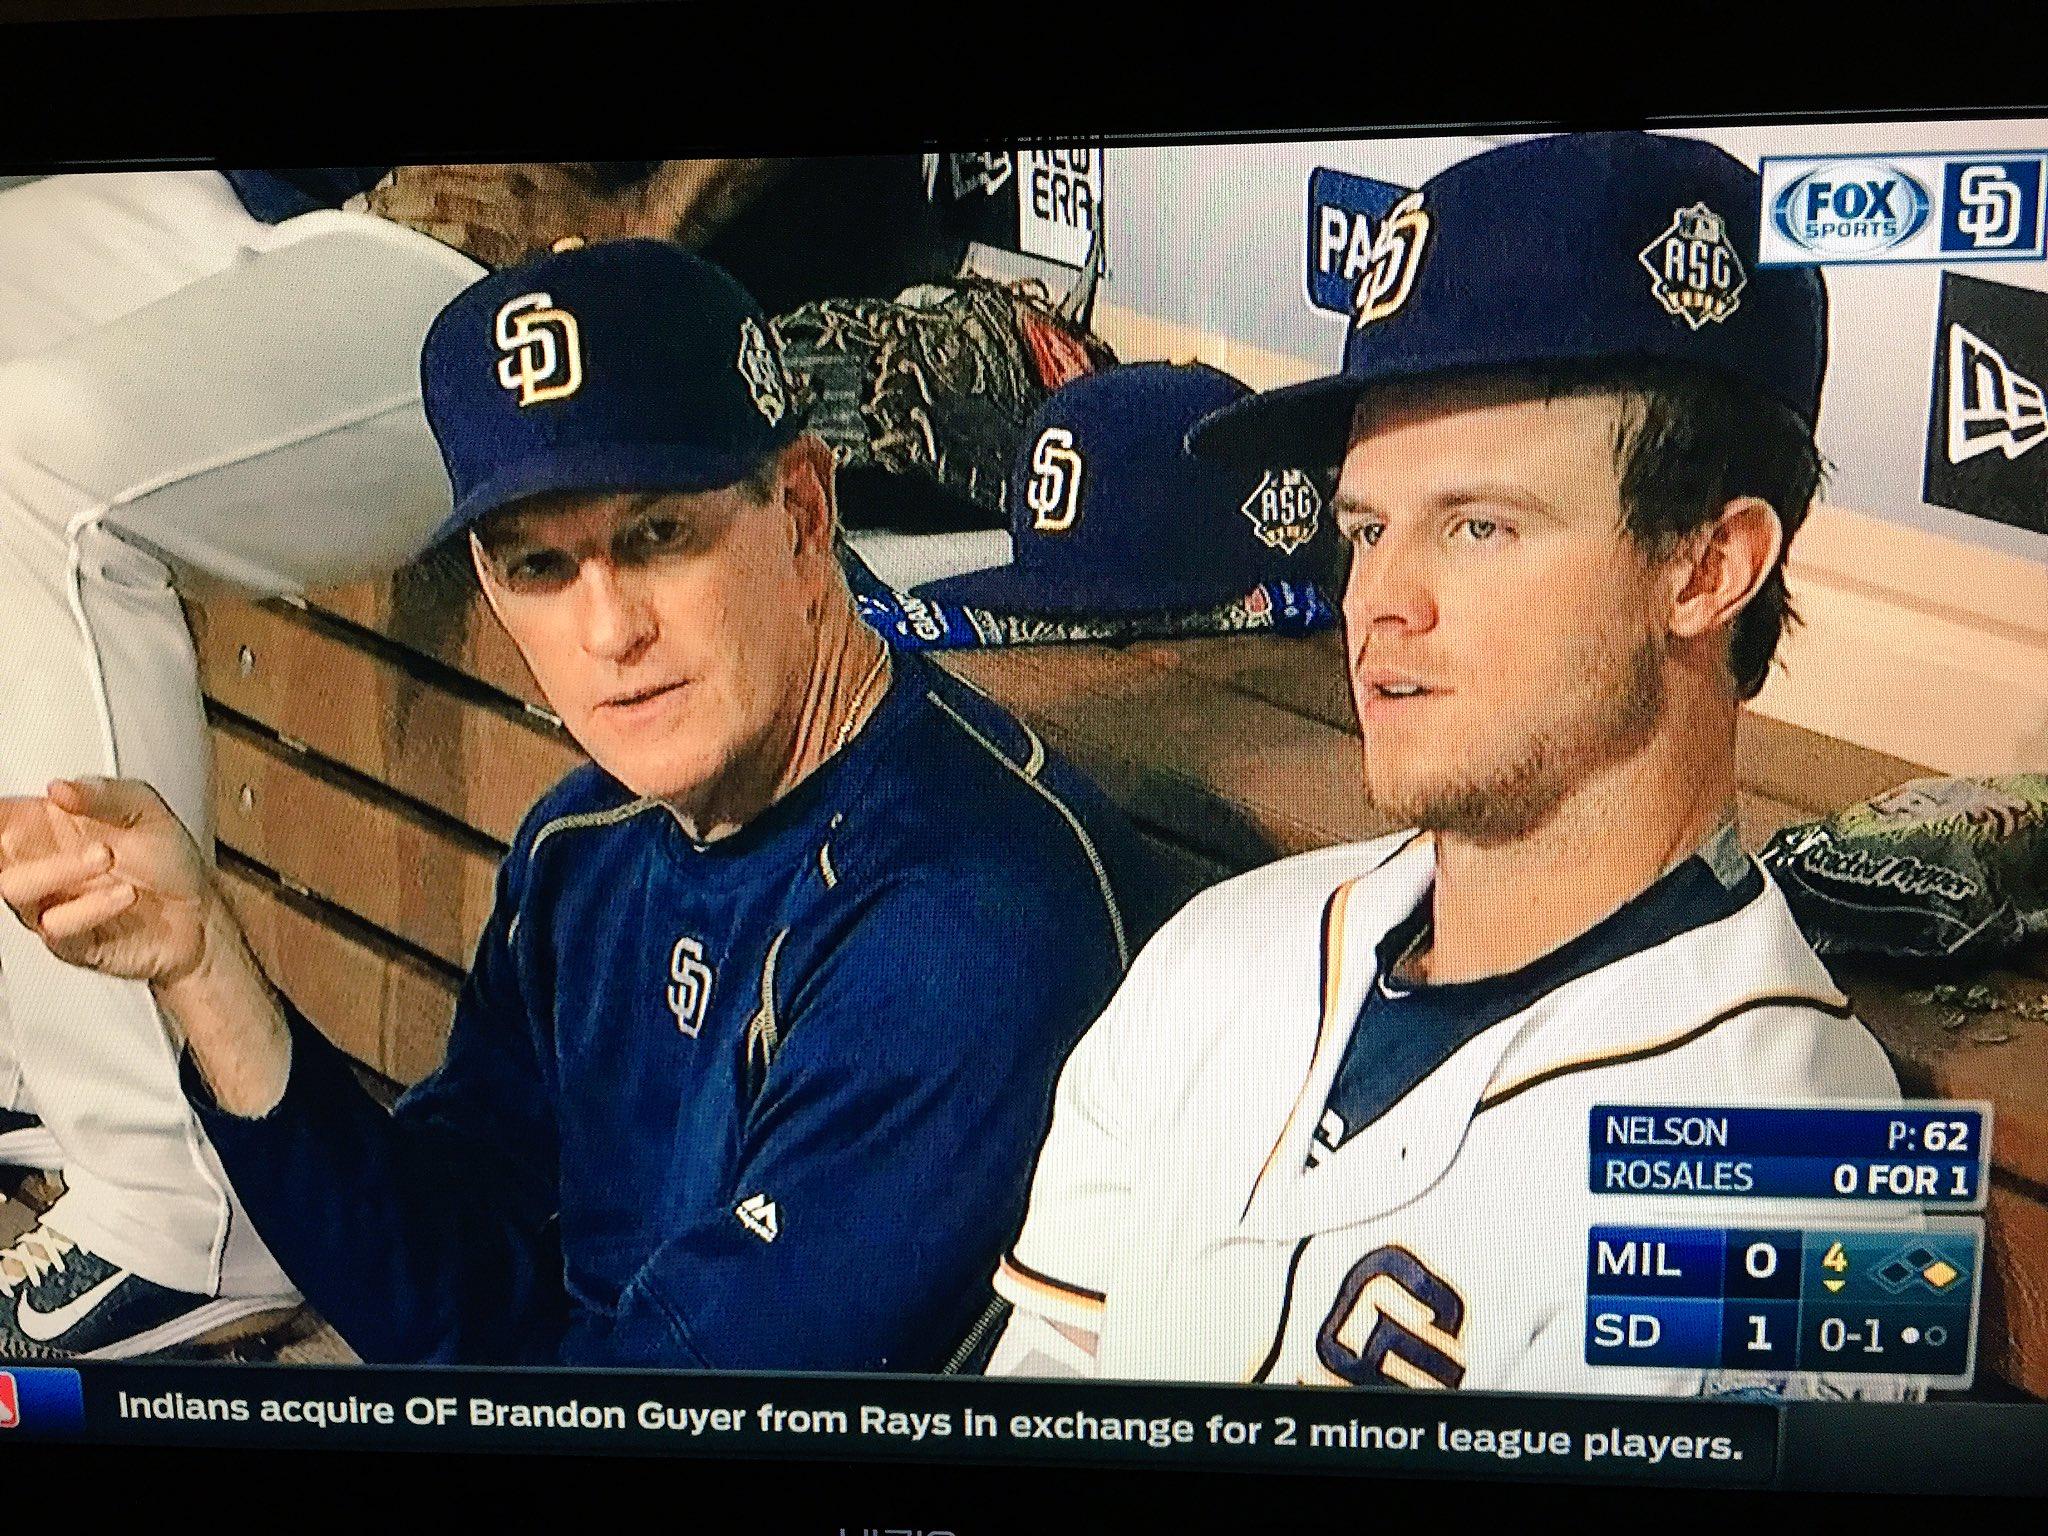 @Friar_Faithful here you go #WMHAU #Padres https://t.co/5l7GEVDAAS